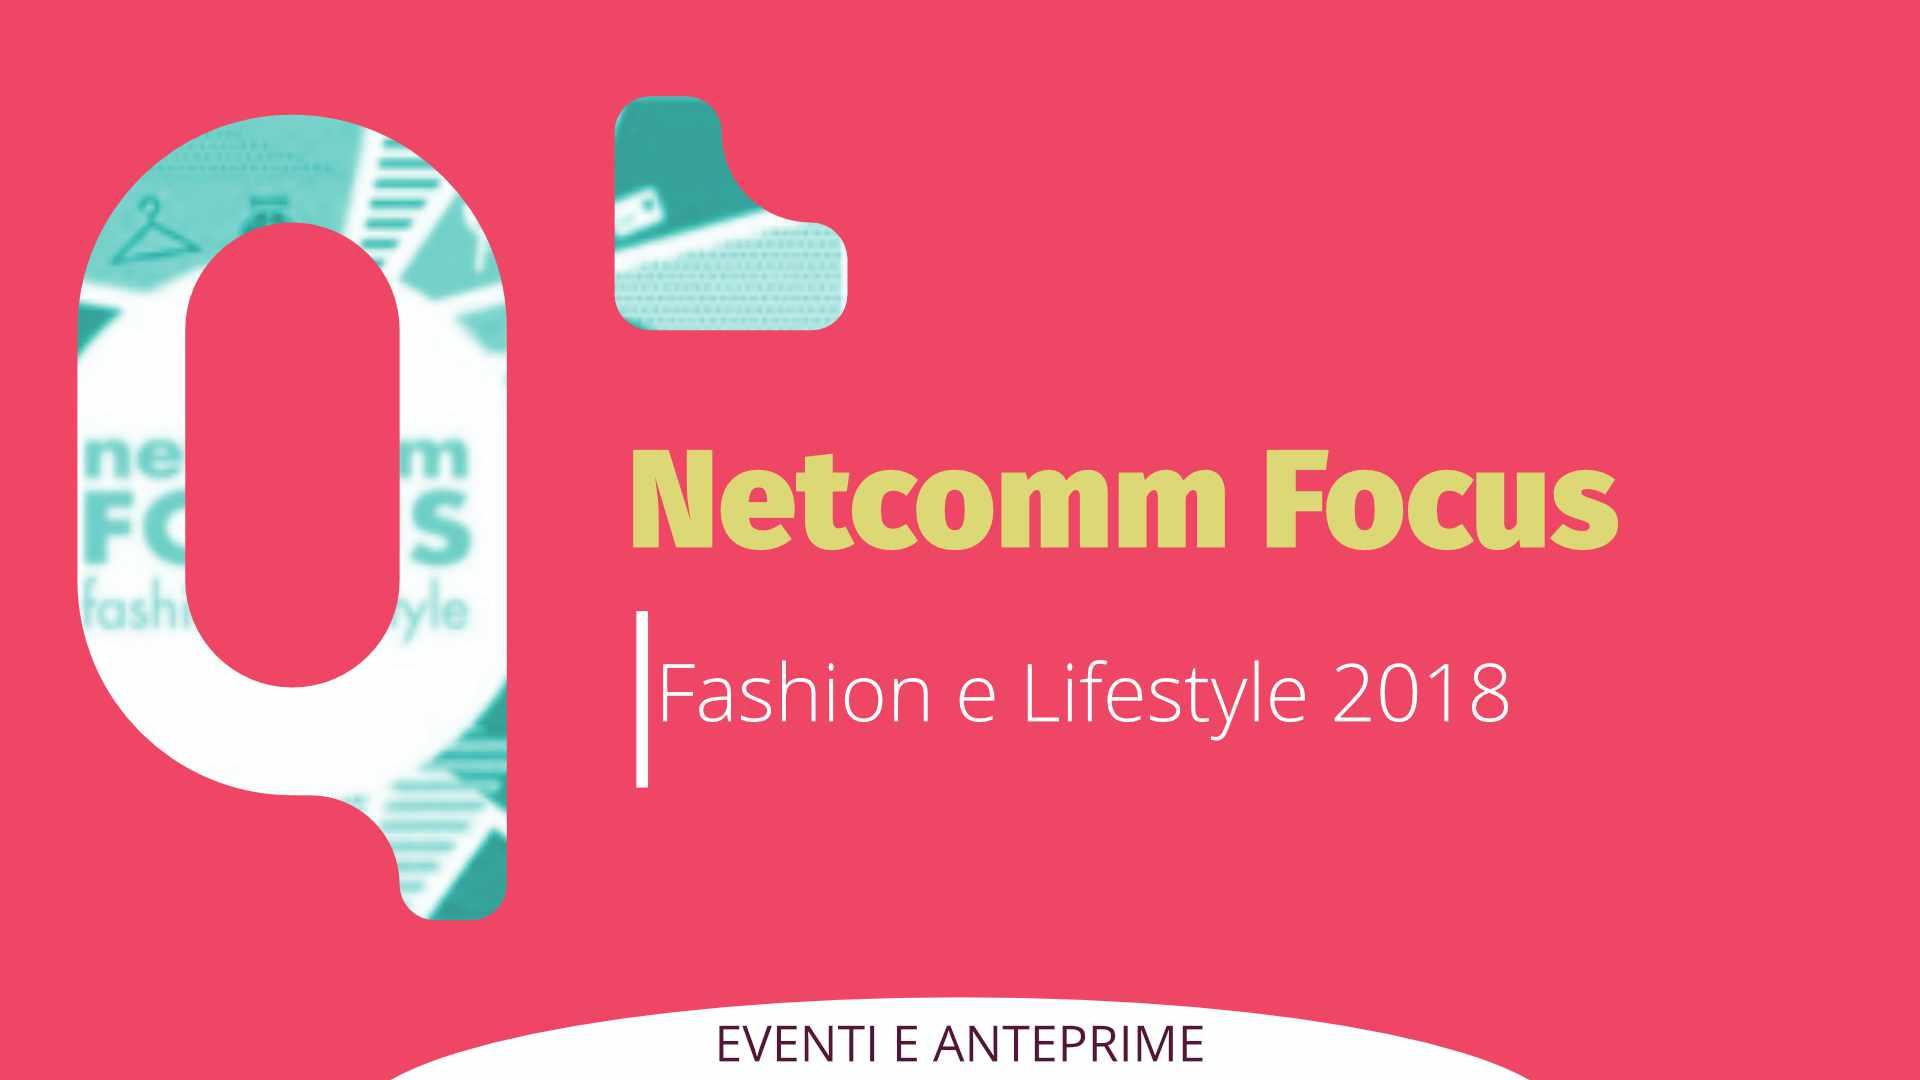 Netcomm Focus Fashion & Lifestyle 2018